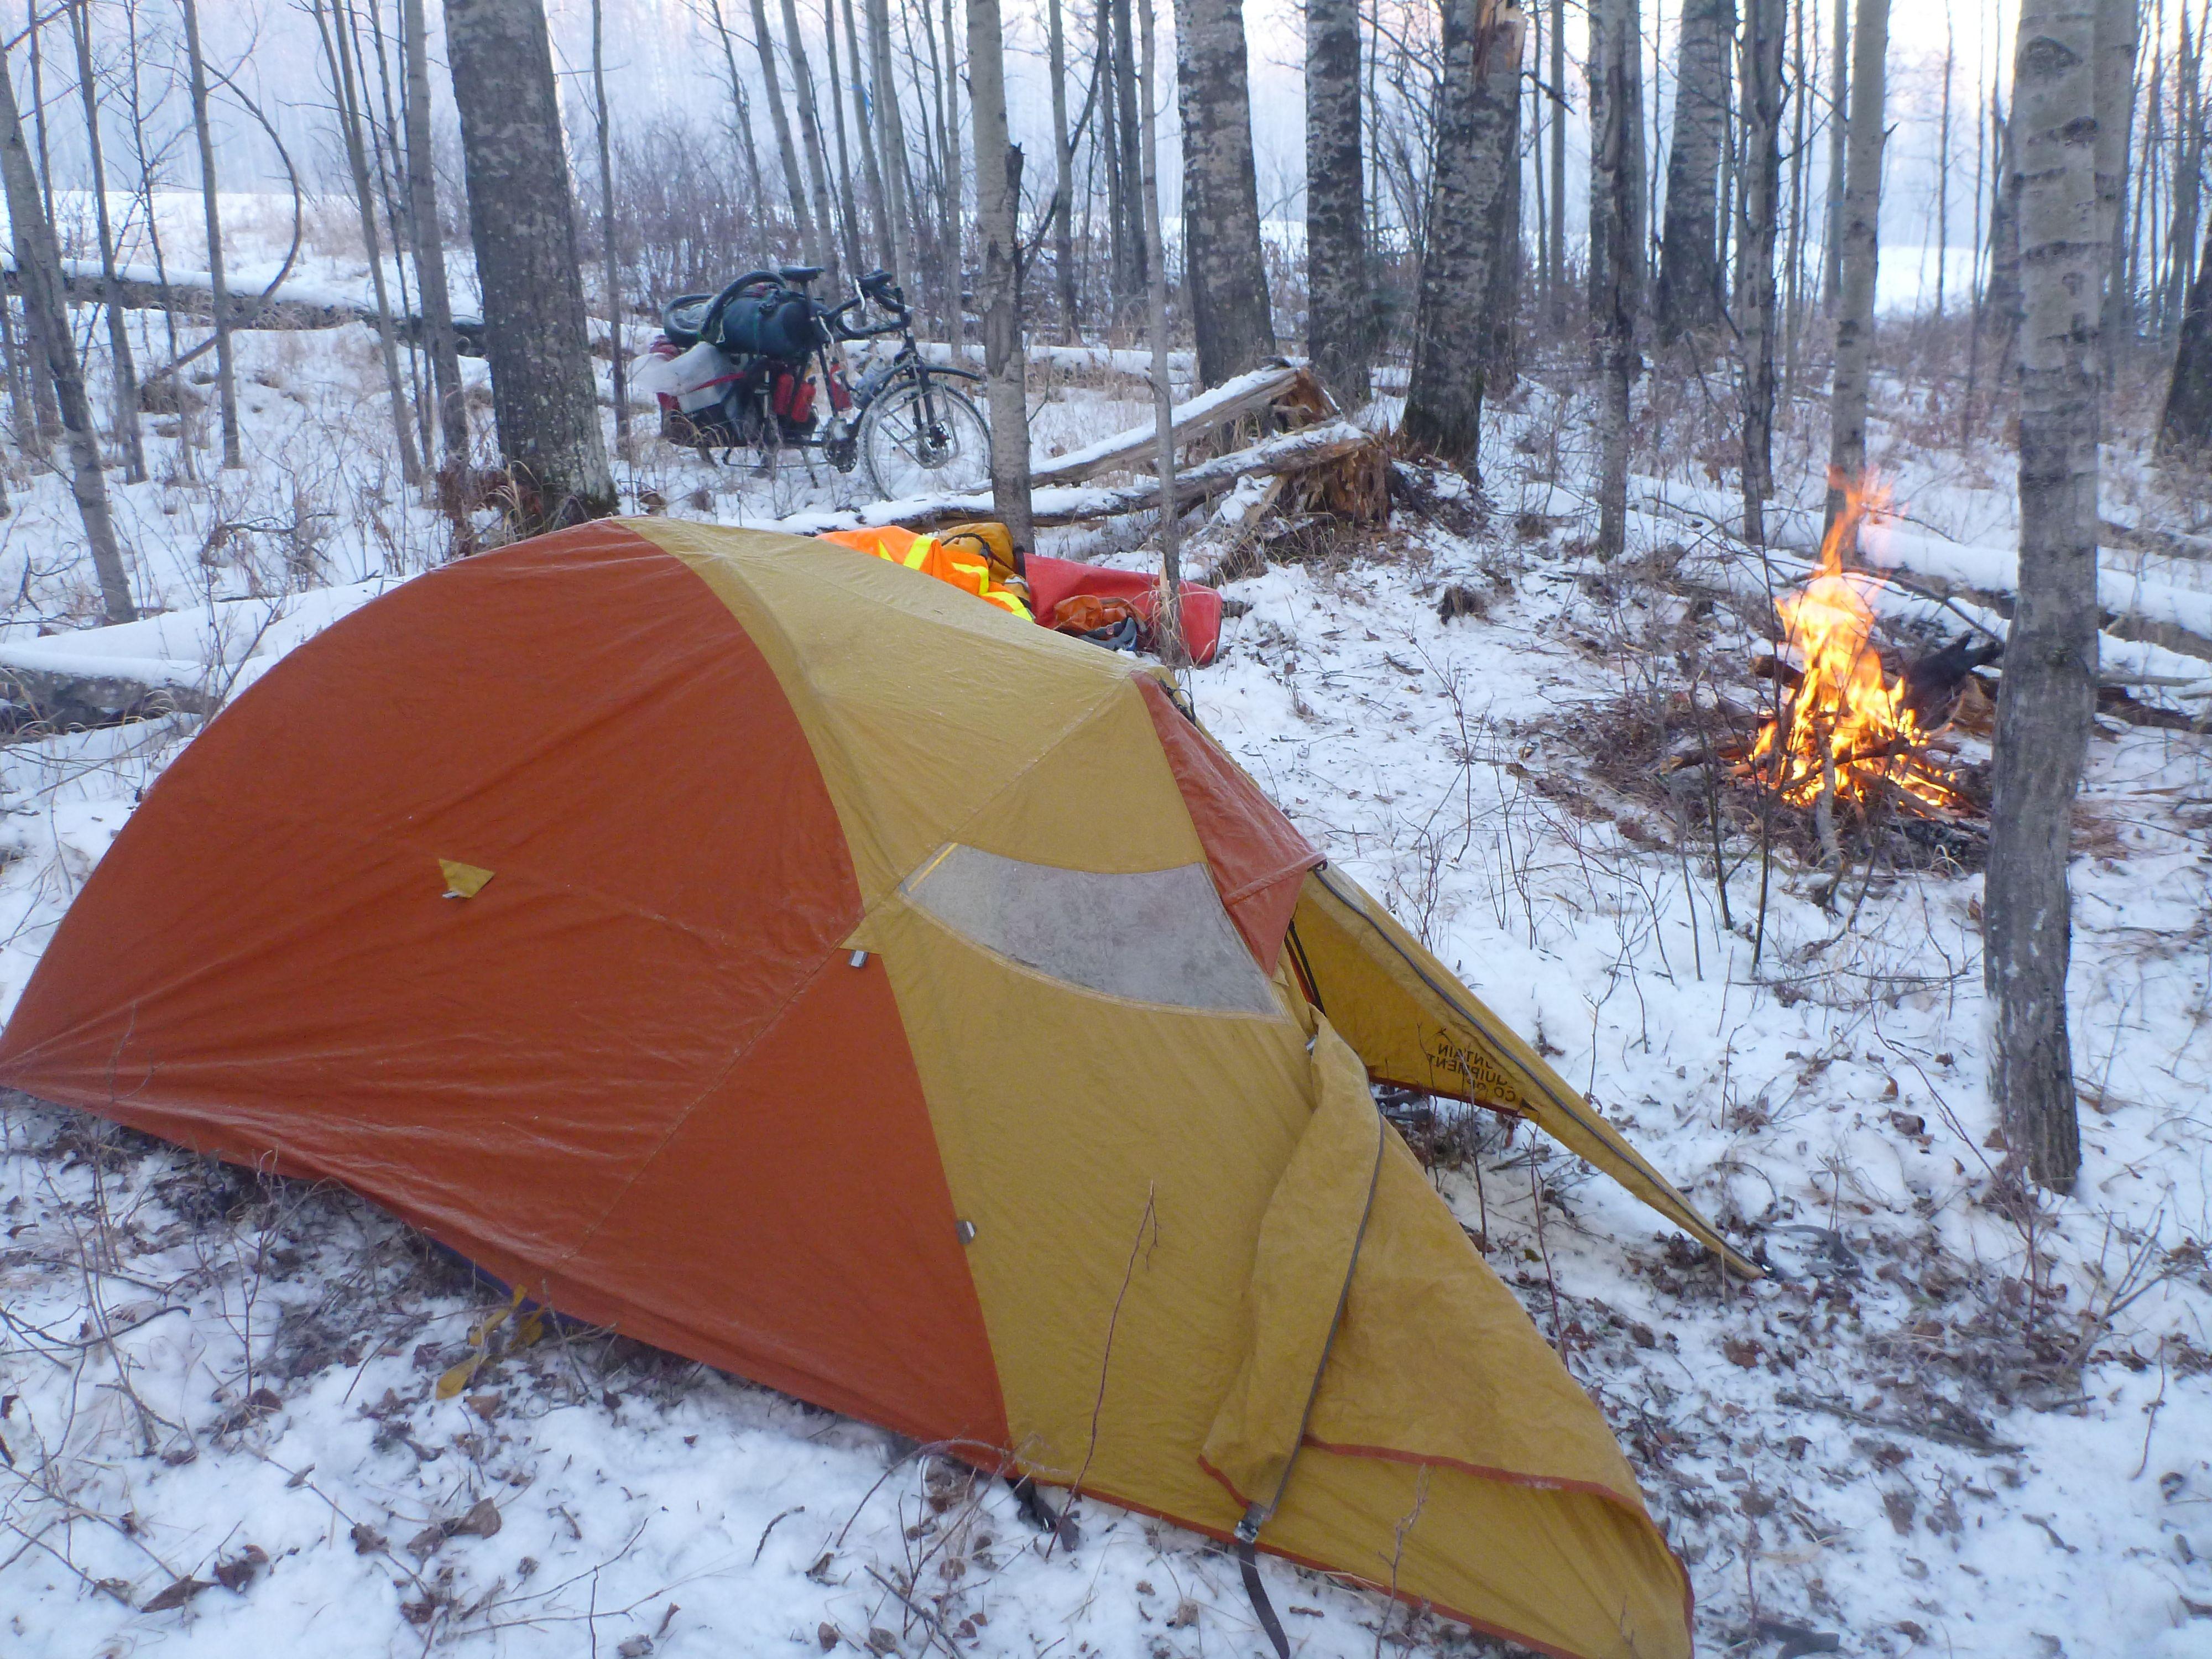 Equipment u campsite winter tips gone fishin pinterest